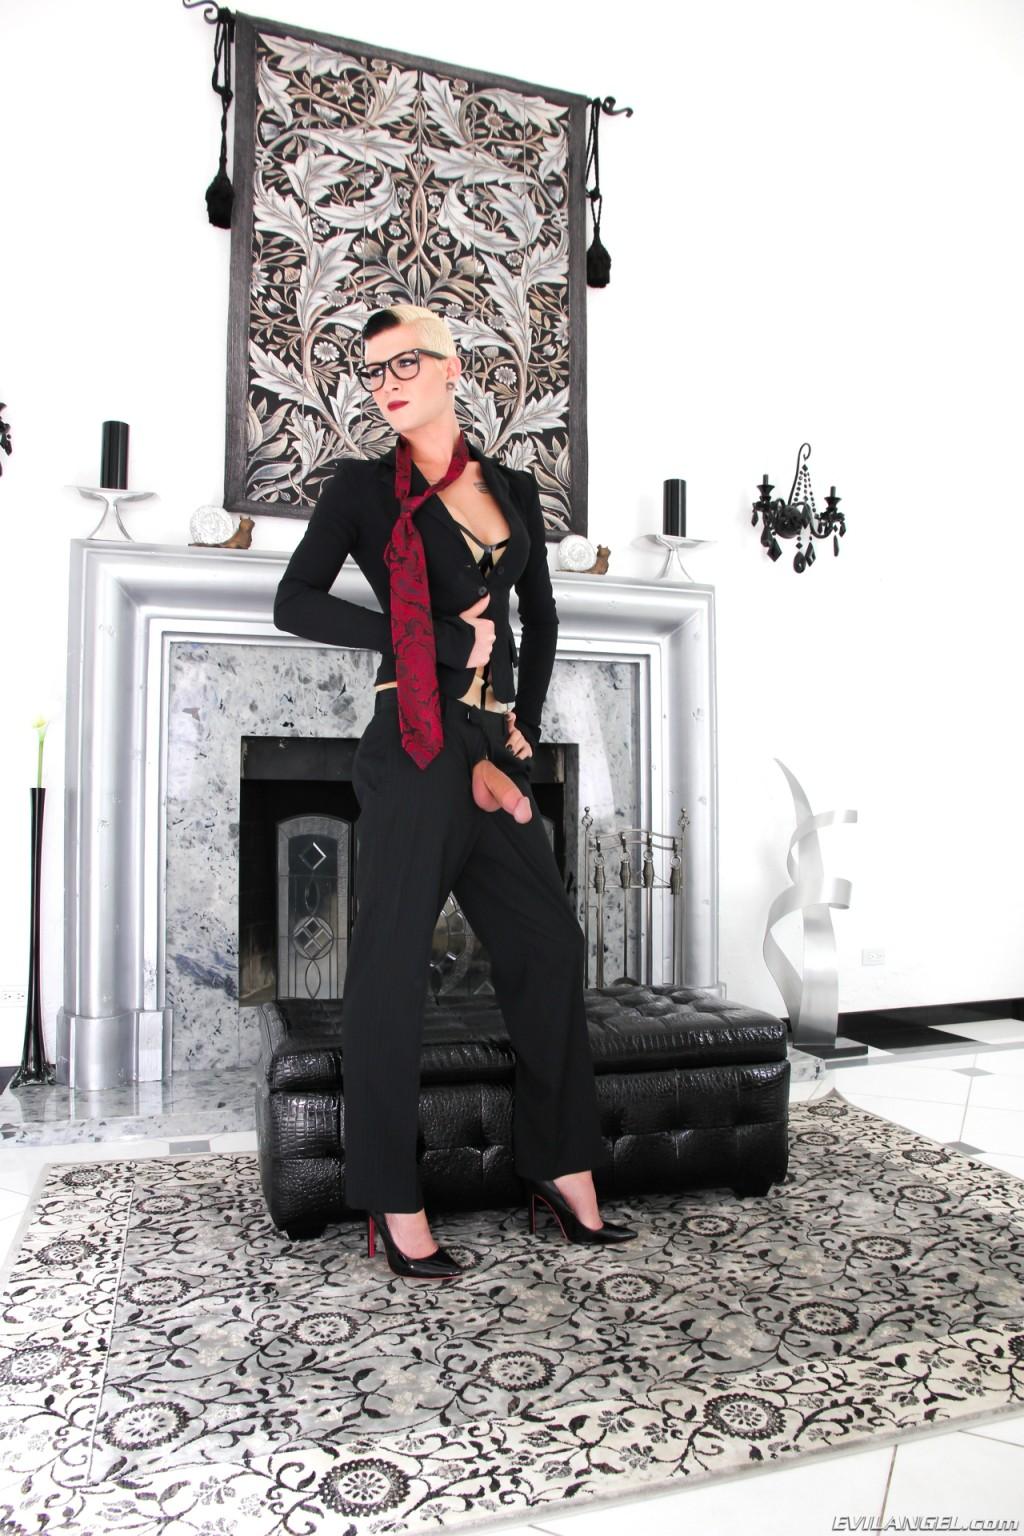 Mccubrey recommend Dallas escort transsexual